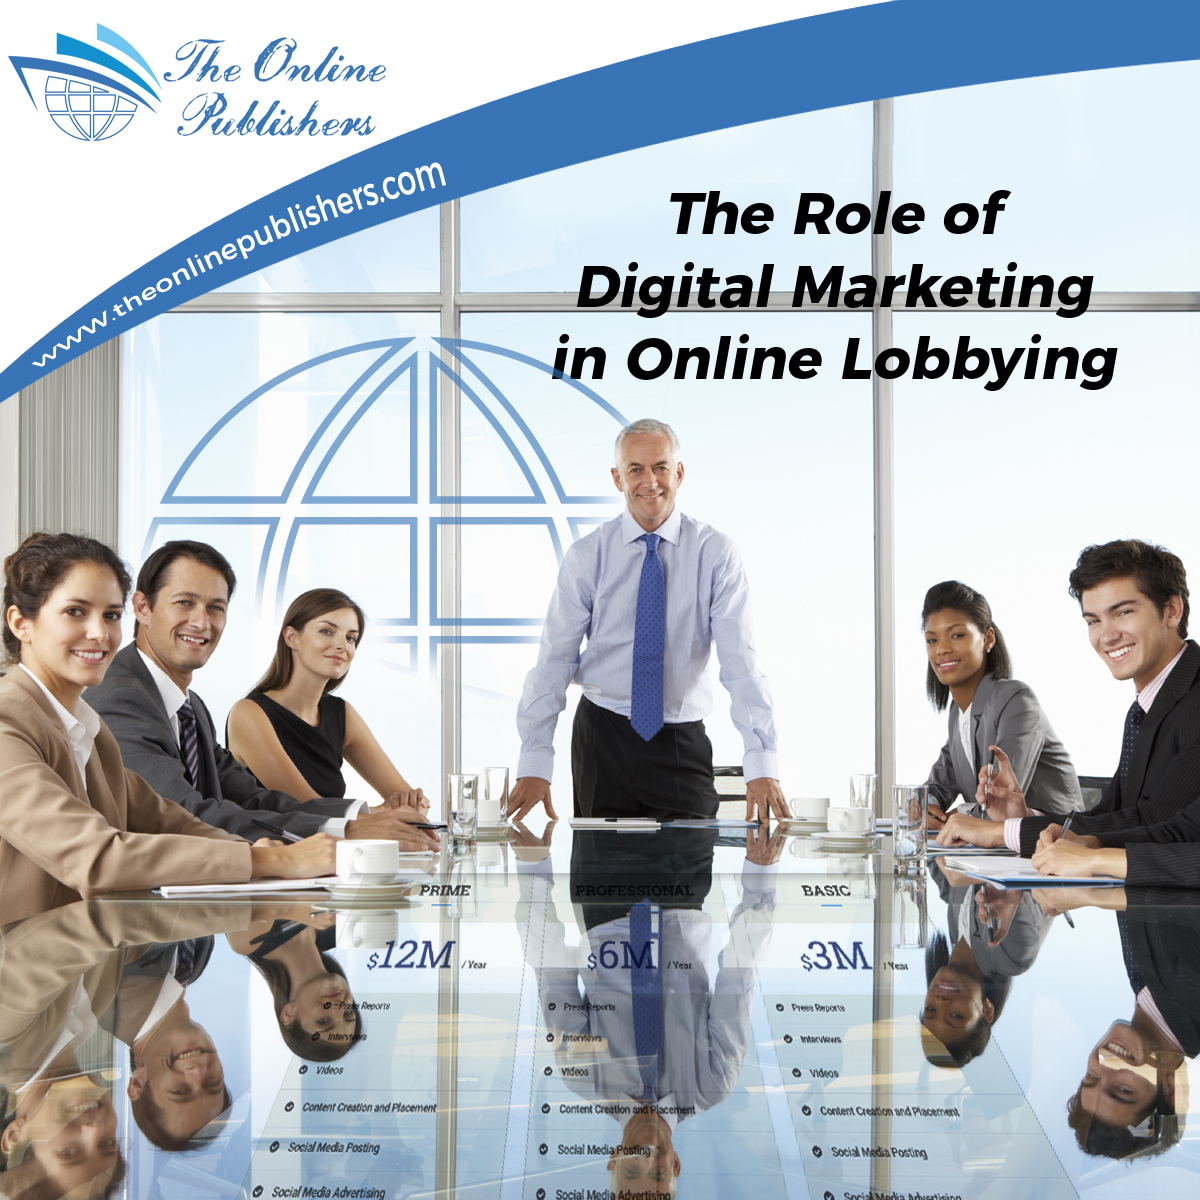 7636websiteOnline Lobbying5